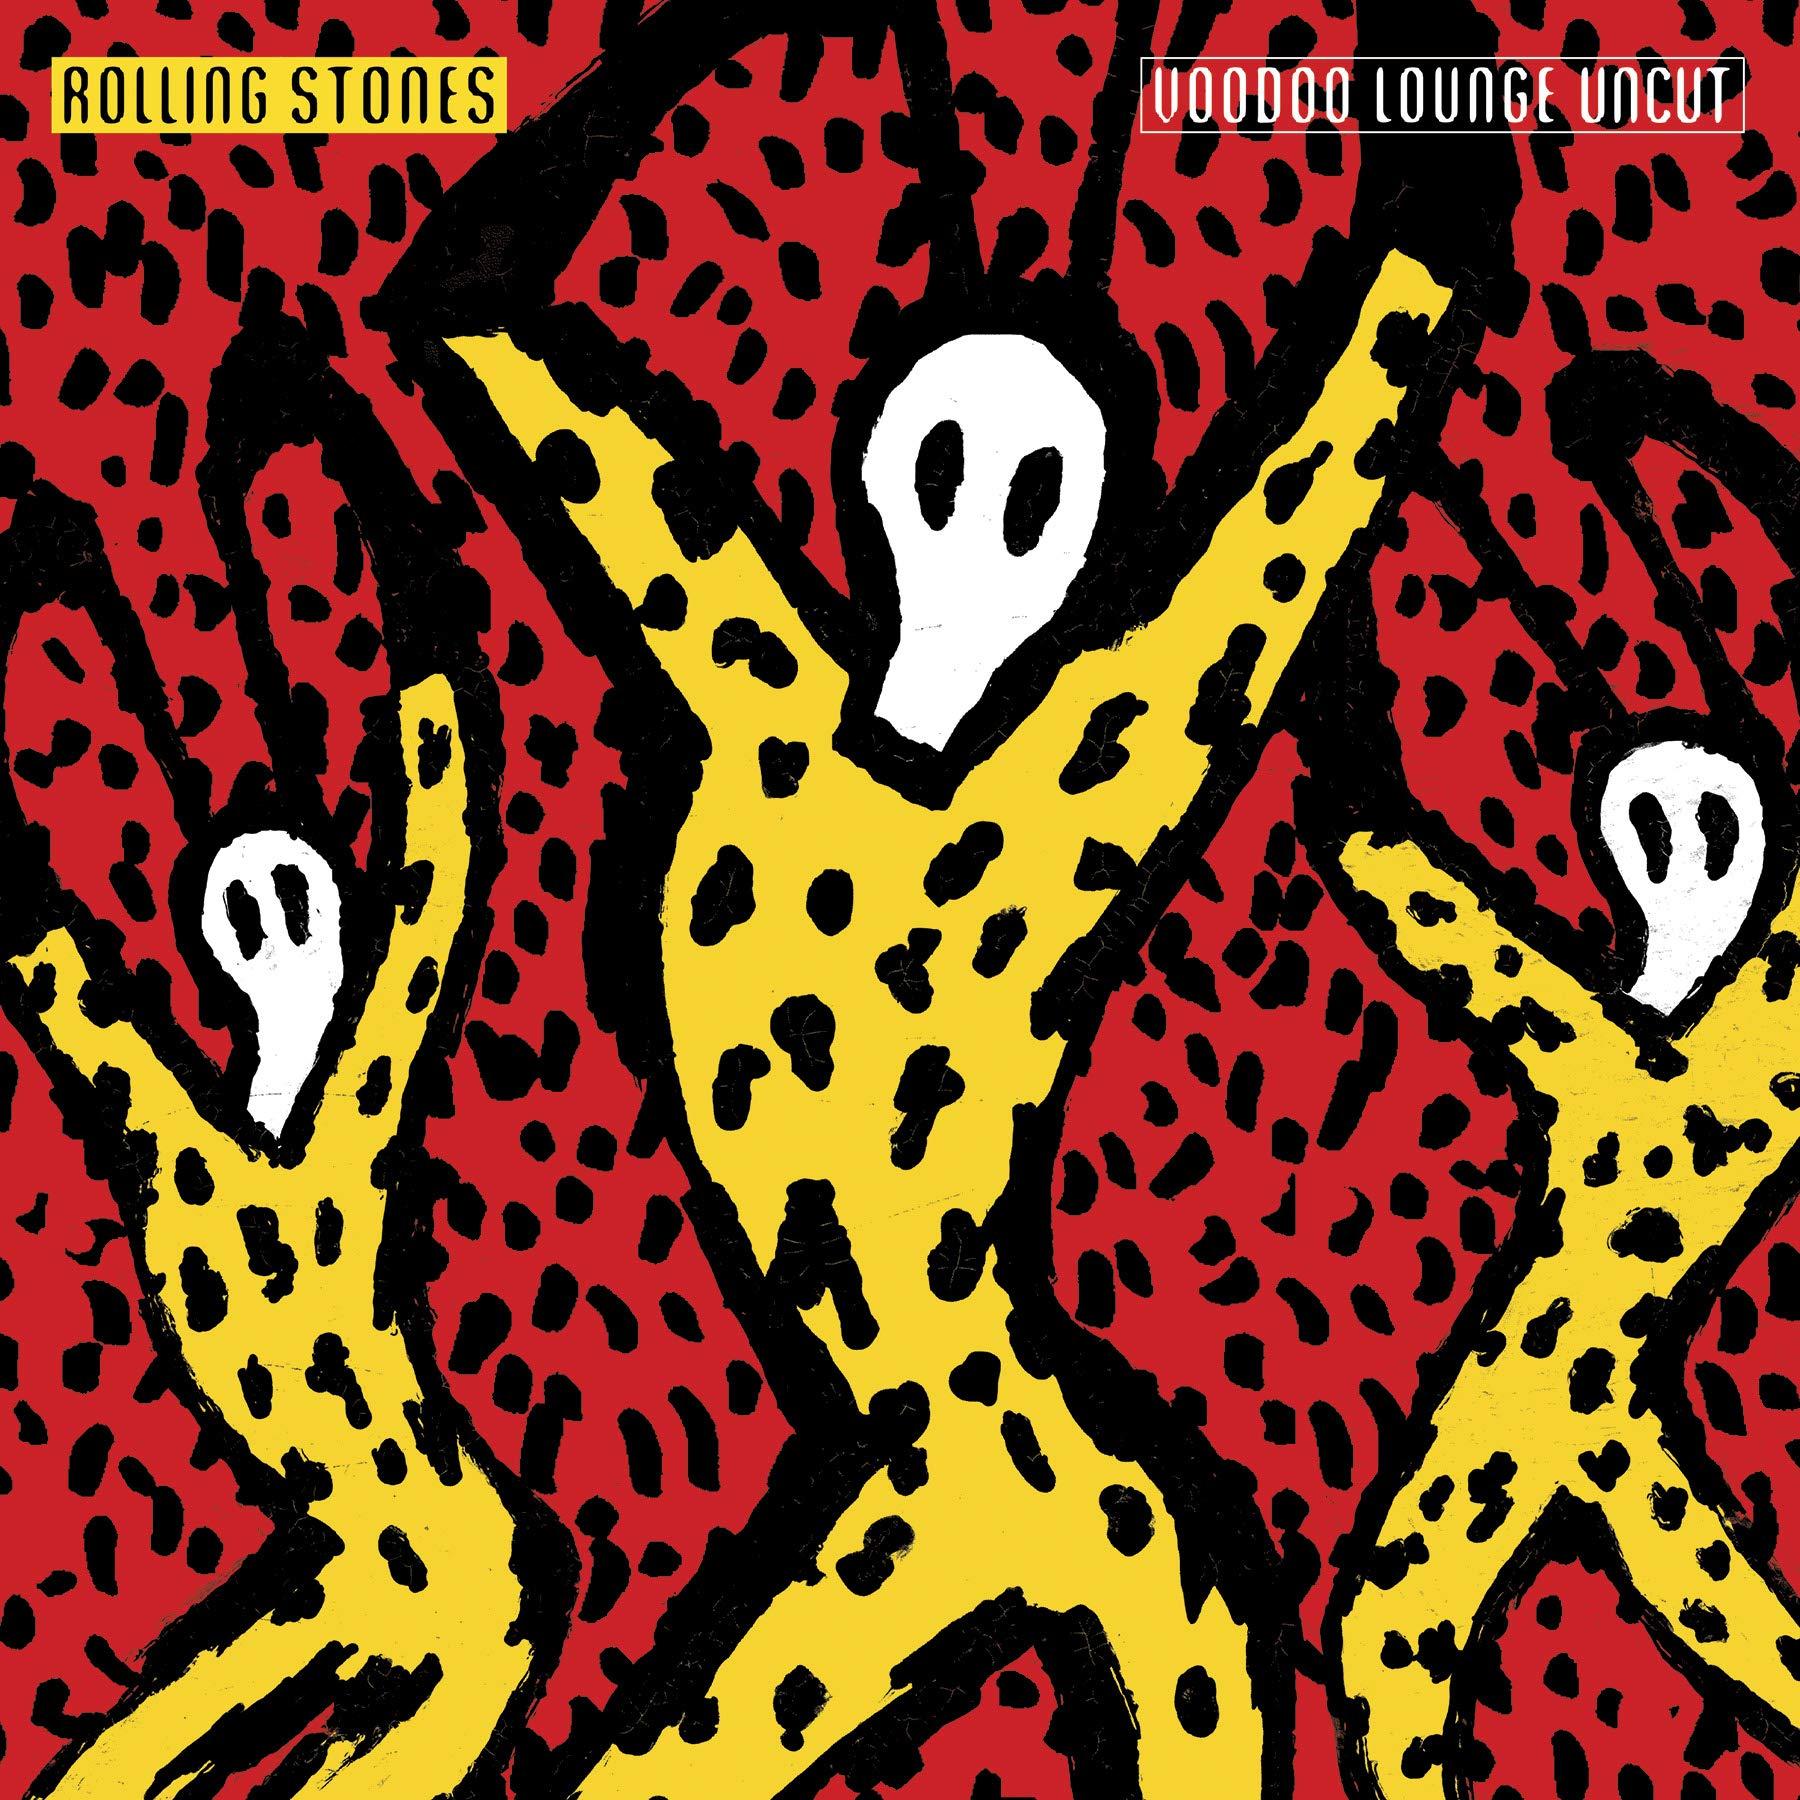 Voodoo Lounge Uncut [3 LP][Red Vinyl] by Eagle Rock Entertainment